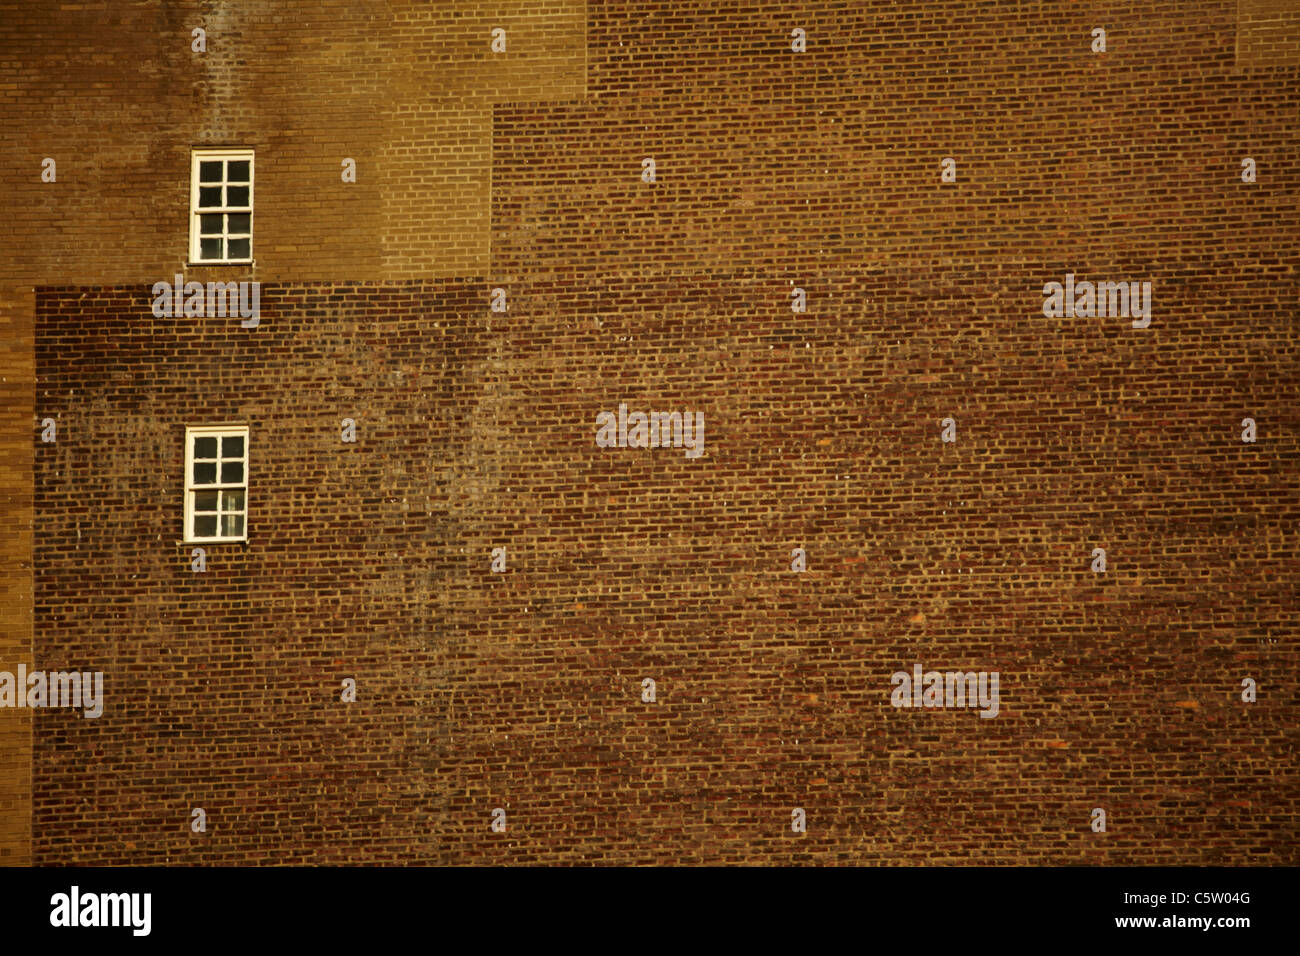 Stati Uniti d'America, New York Manhattan, muro di mattoni, full frame Immagini Stock